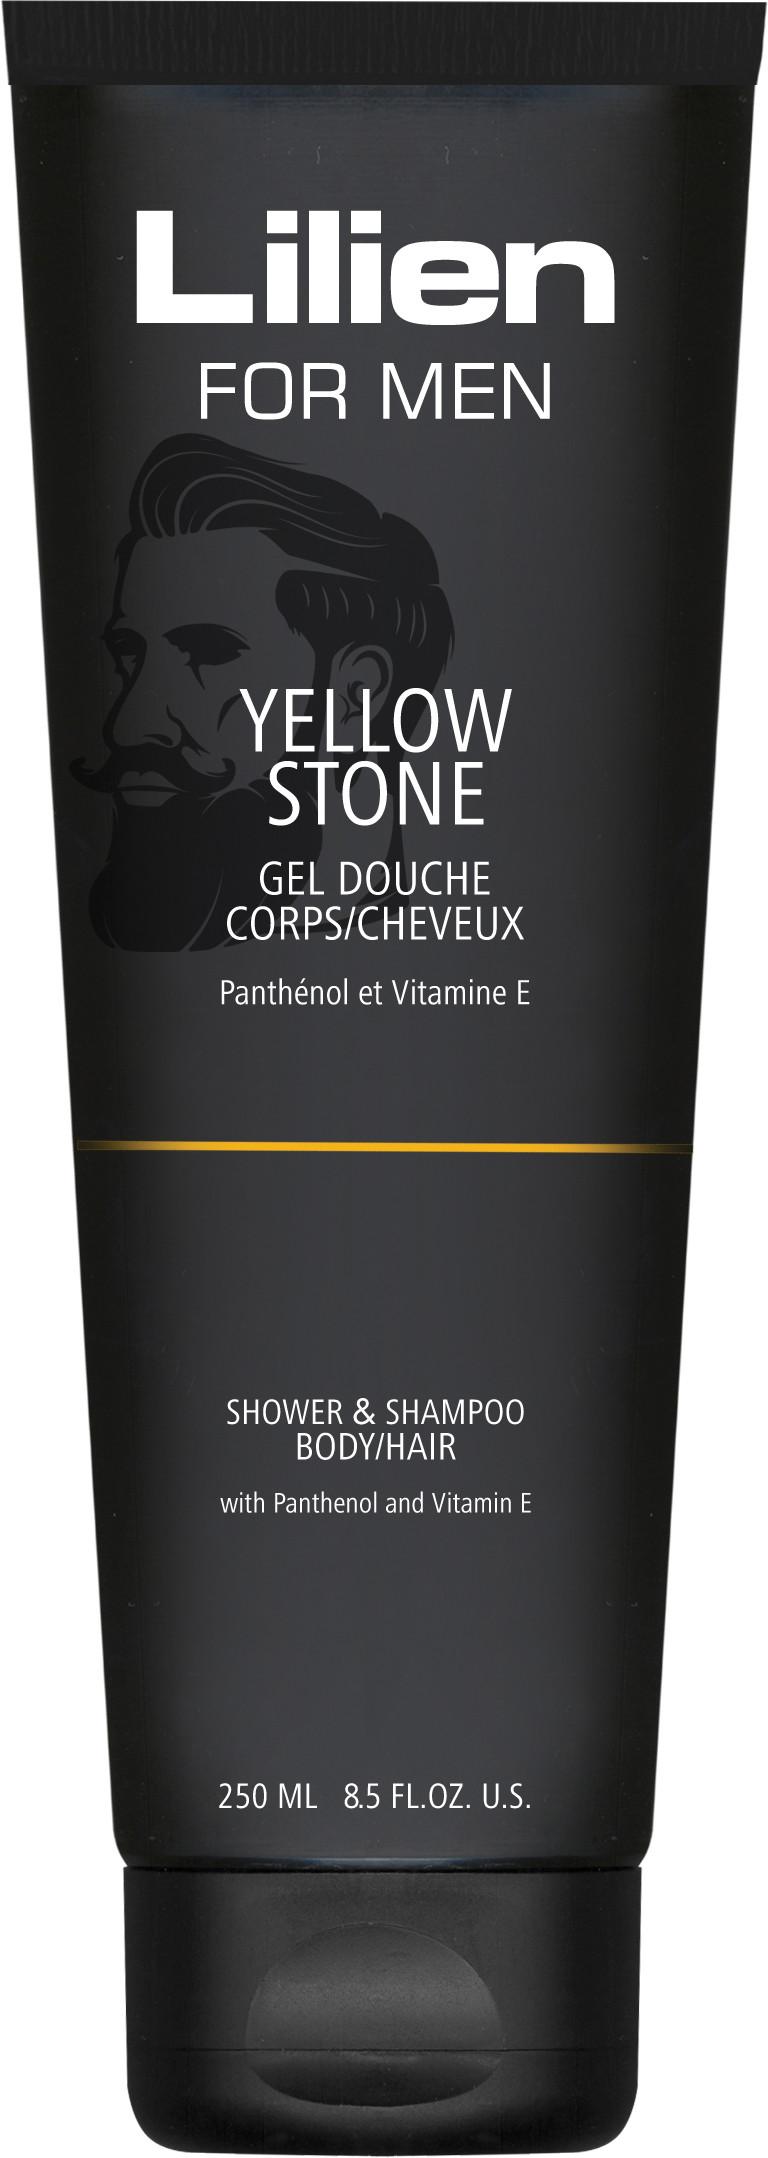 Lilien for men shower gel Yellow Stone 250ml